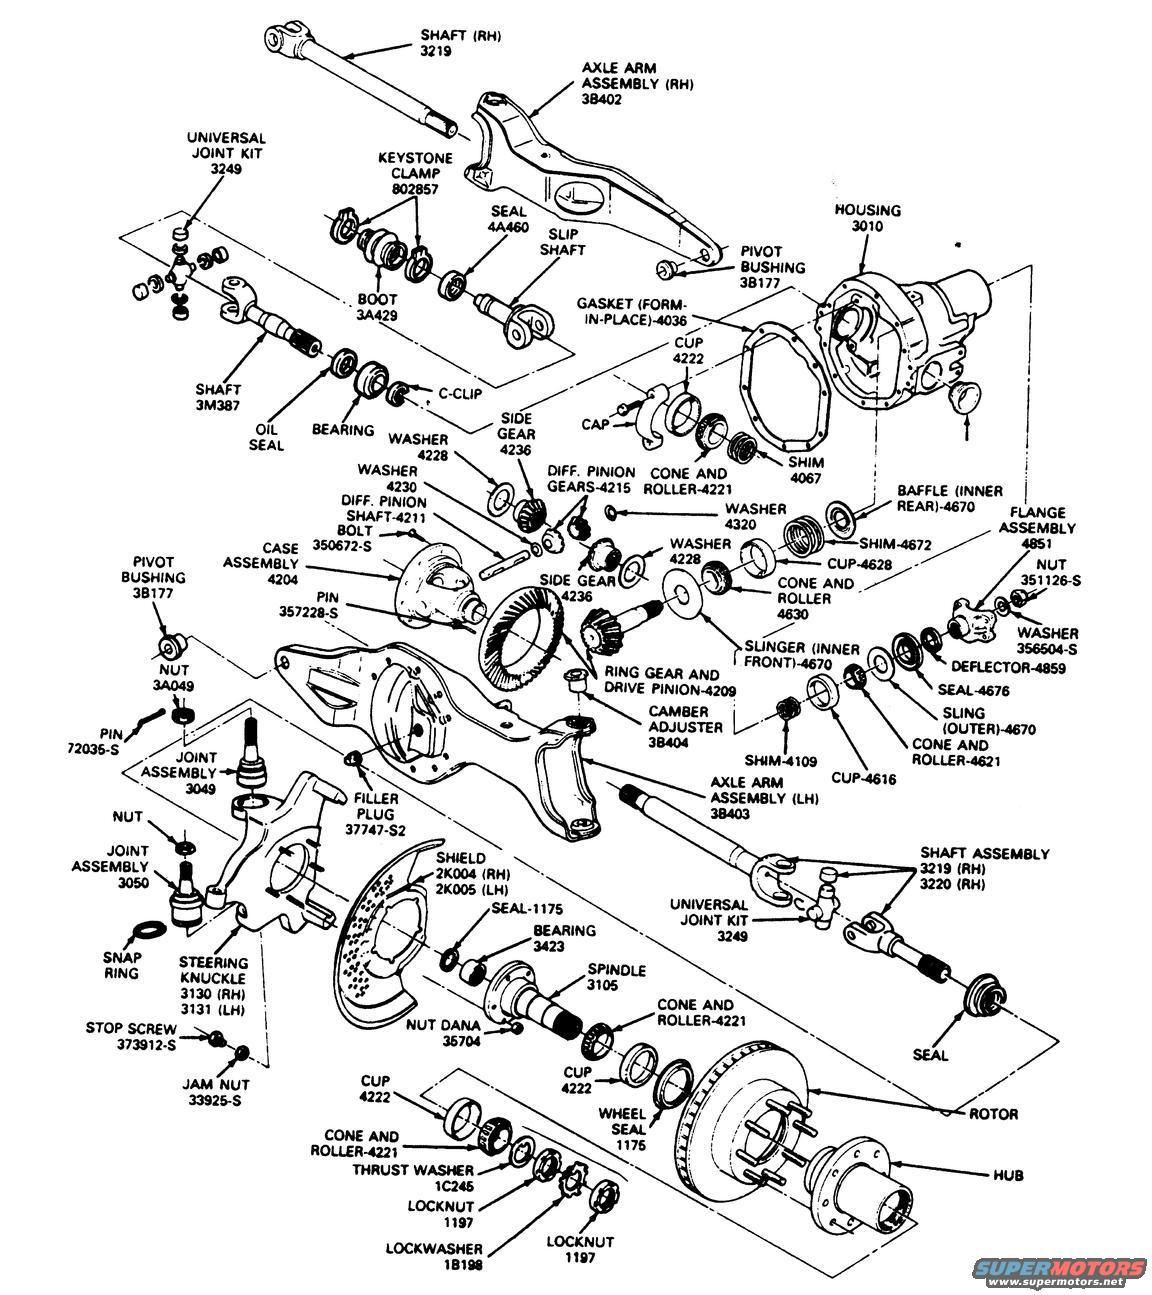 1995 ford f150 front suspension diagram car cigarette lighter socket wiring 1983 bronco diagrams picture supermotors